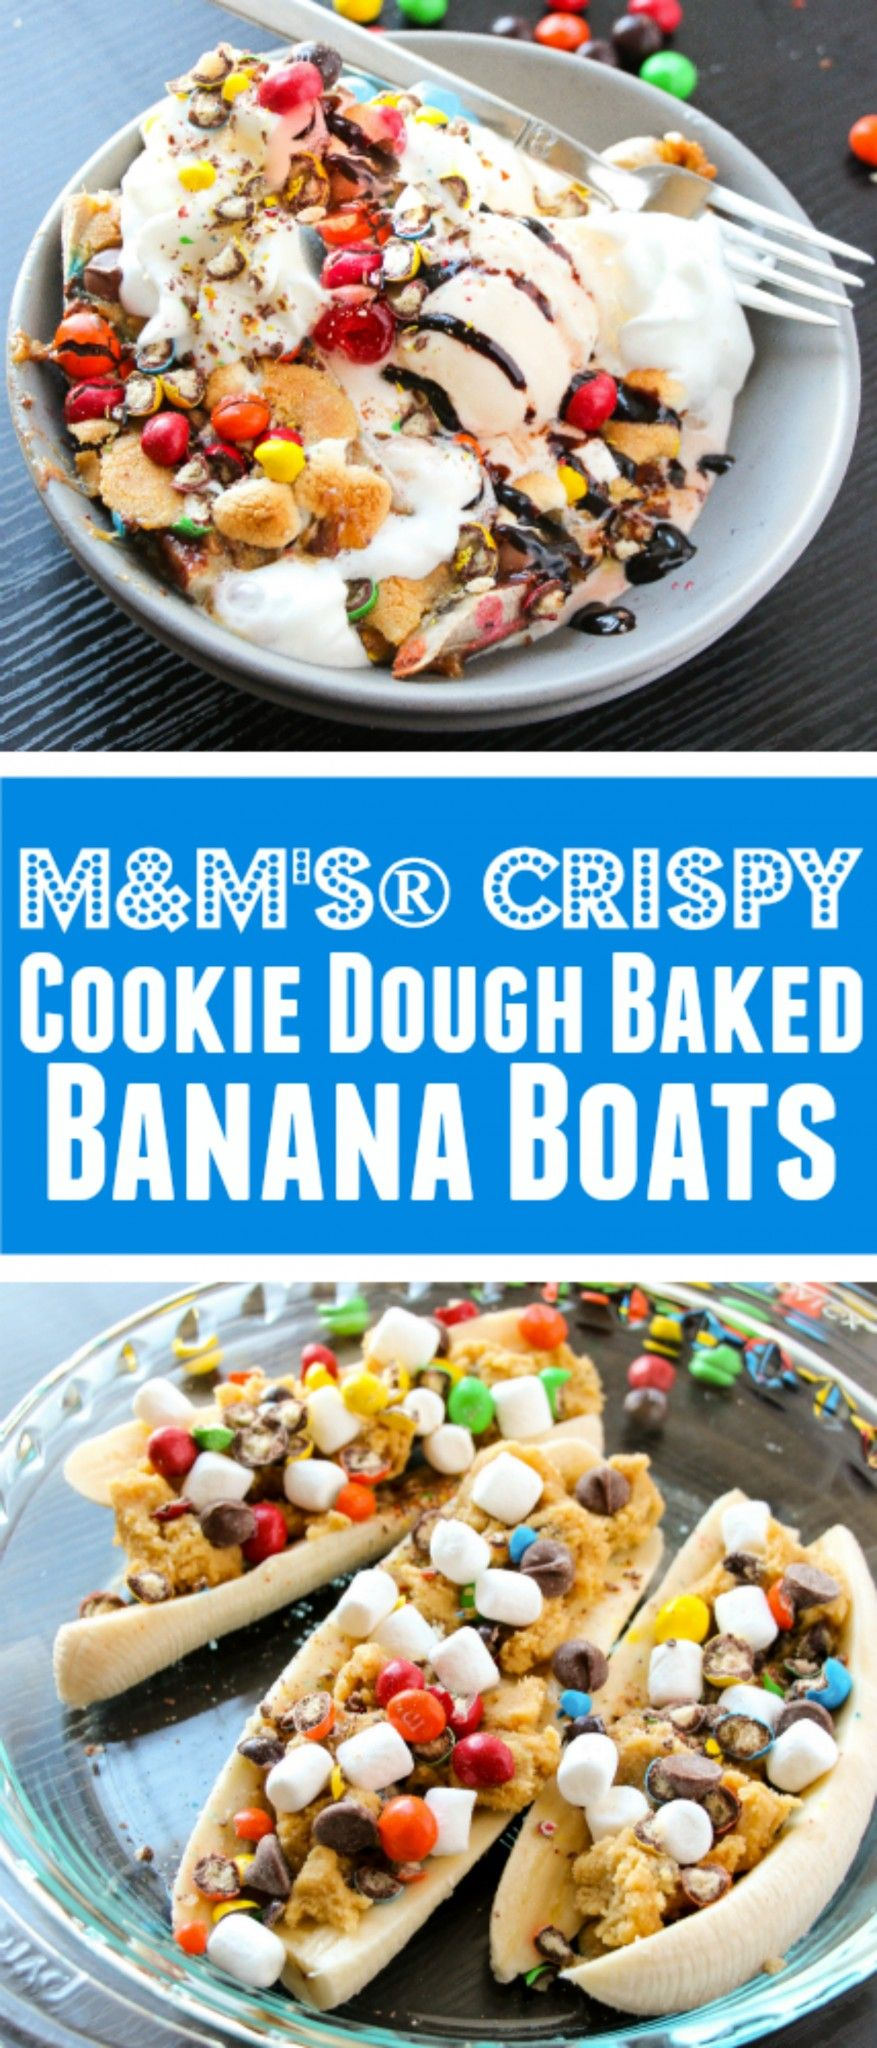 M&M's® Crispy Cookie Dough Baked Banana Boats - Like a baked Banana Split with COOKIE DOUGH! #CrispyComeback #ad